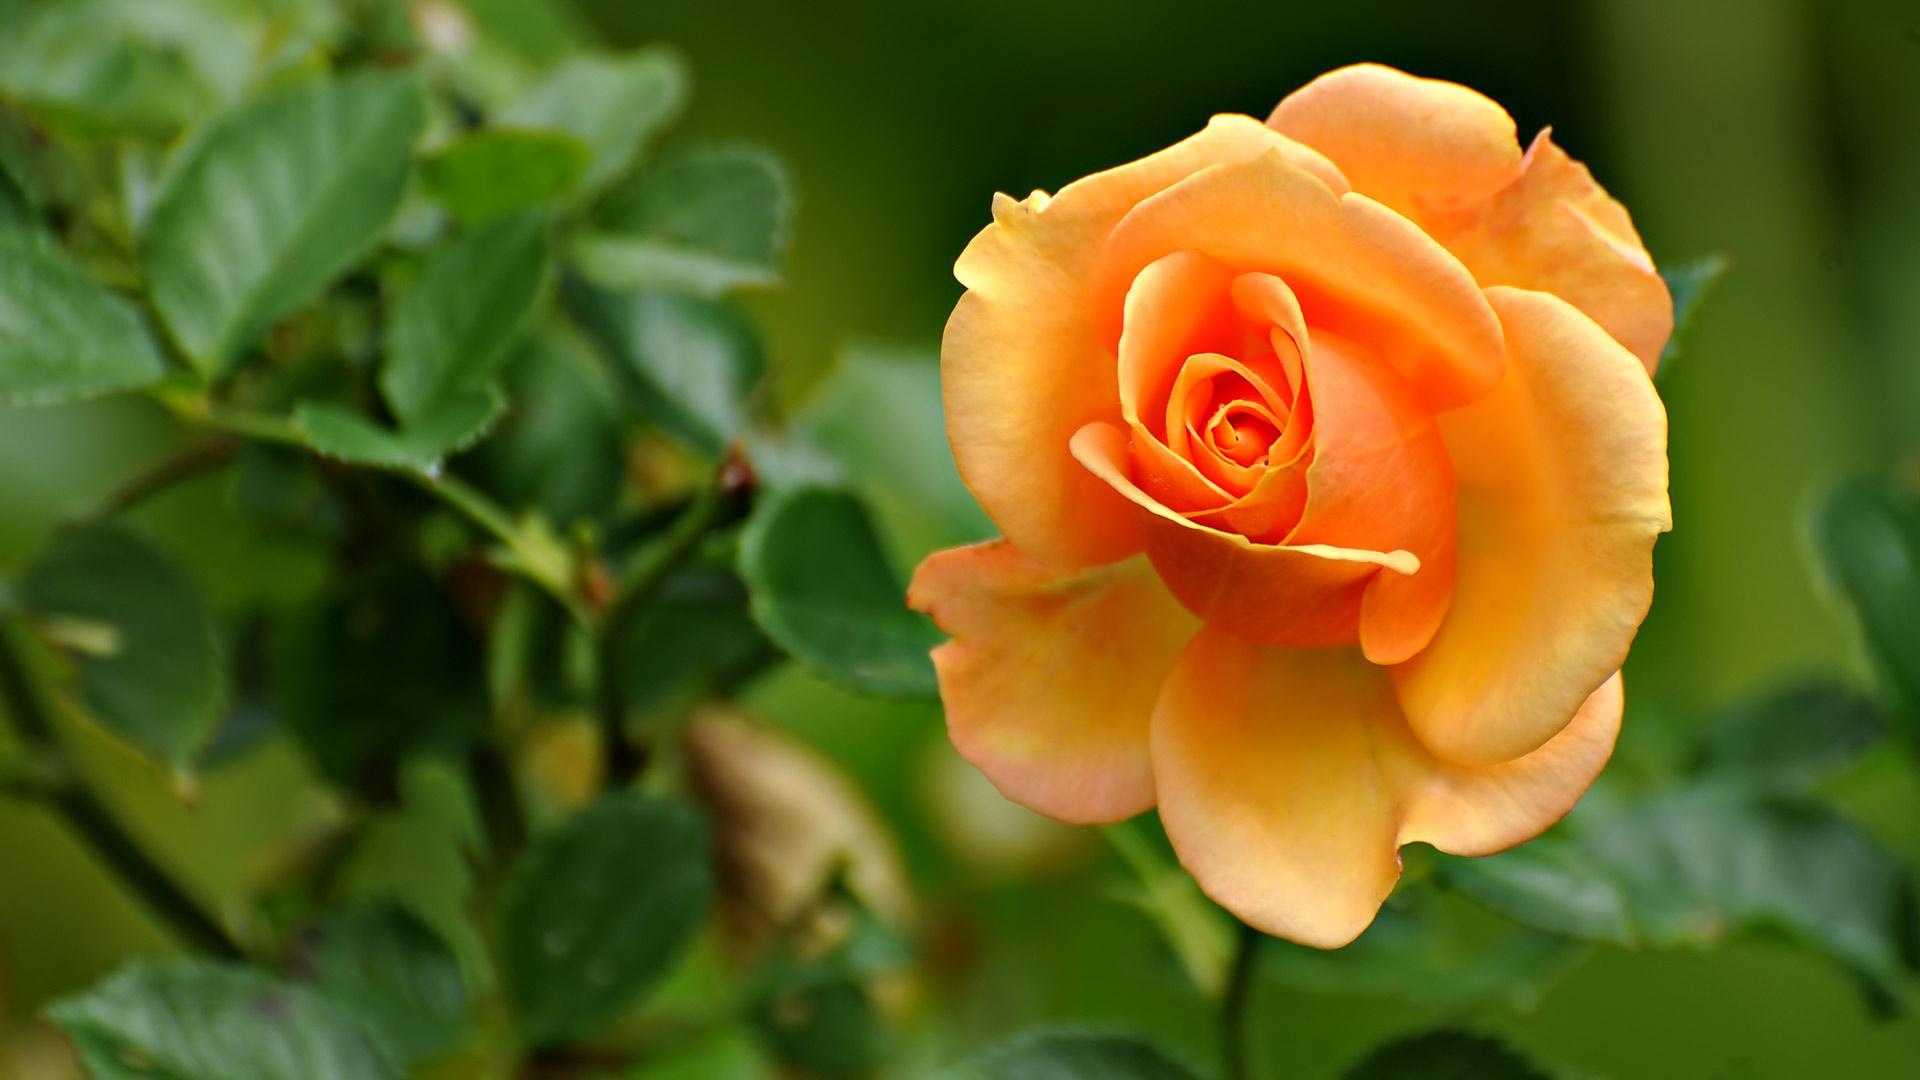 Awesome Orange Rose Flowers Wallpaper HD Widescreen - Wallsev.com - Download Free HD Wallpapers